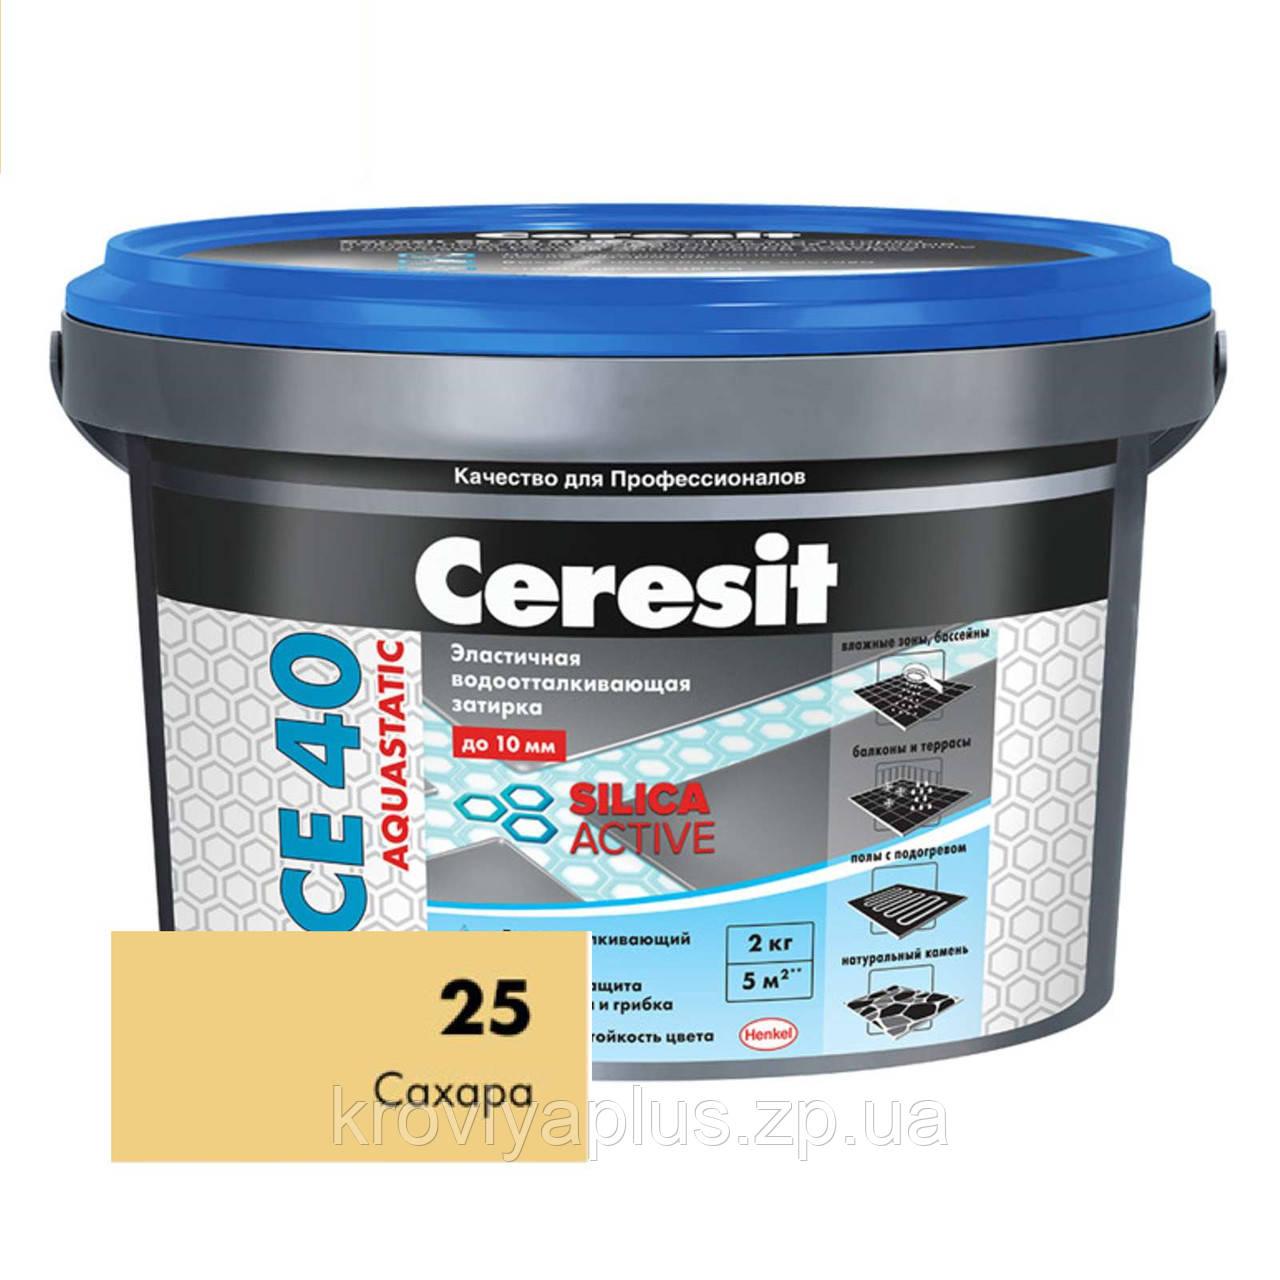 Затирка для швов Ceresit СЕ 40 Aquastatic сахара (25)